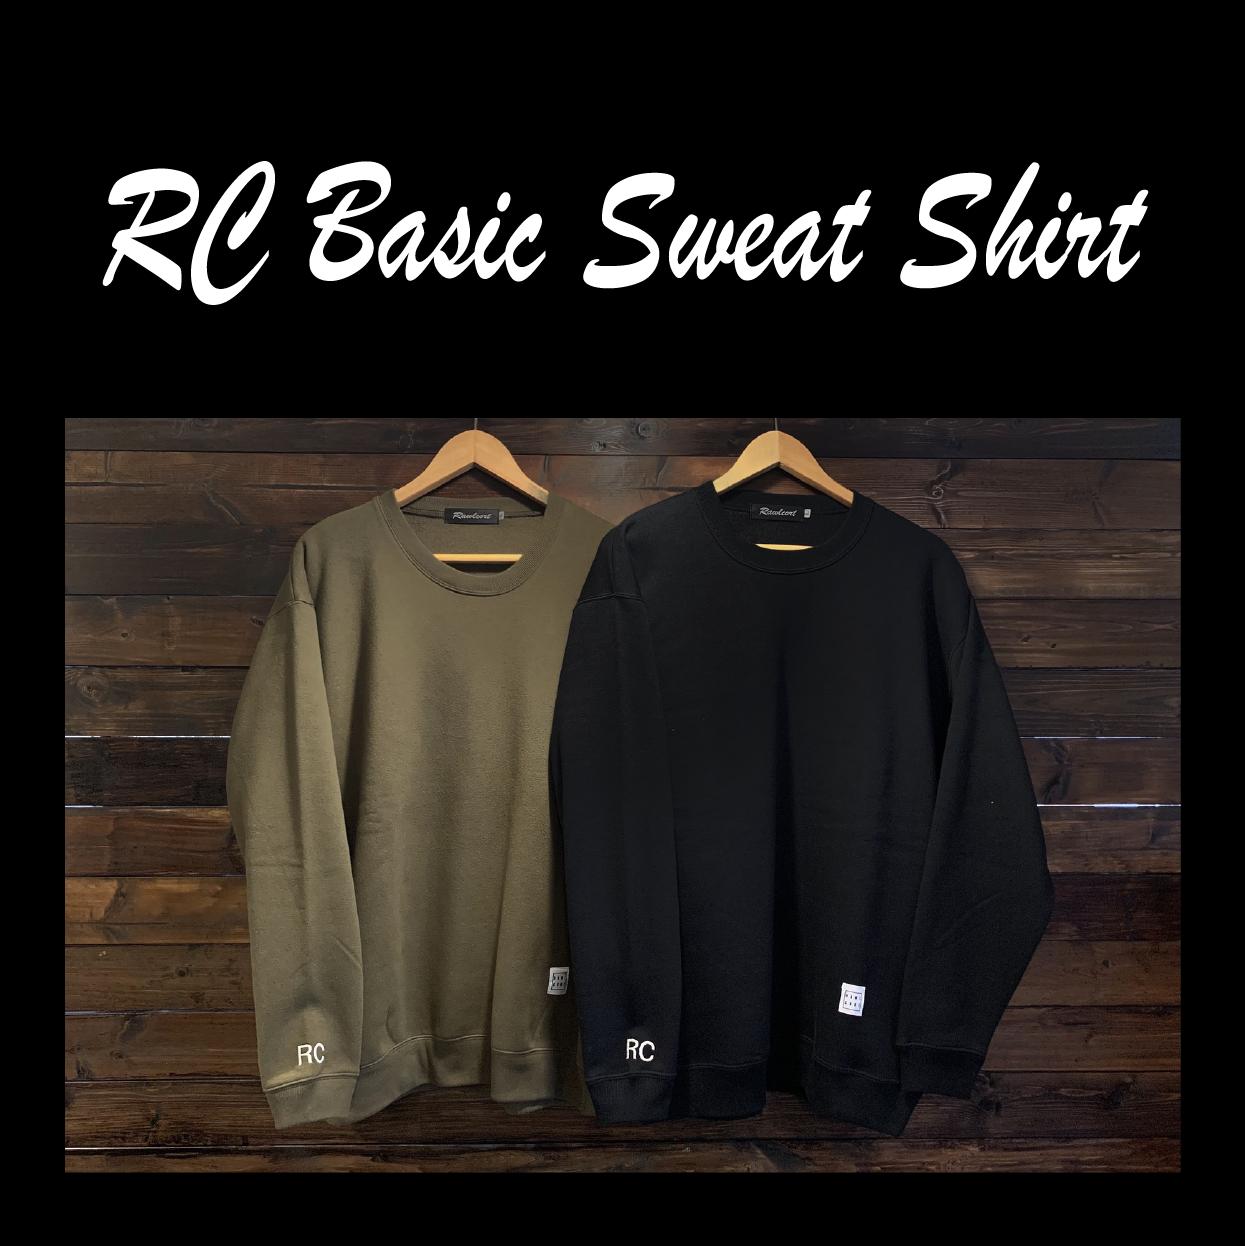 RC Basic Sweat Shirt